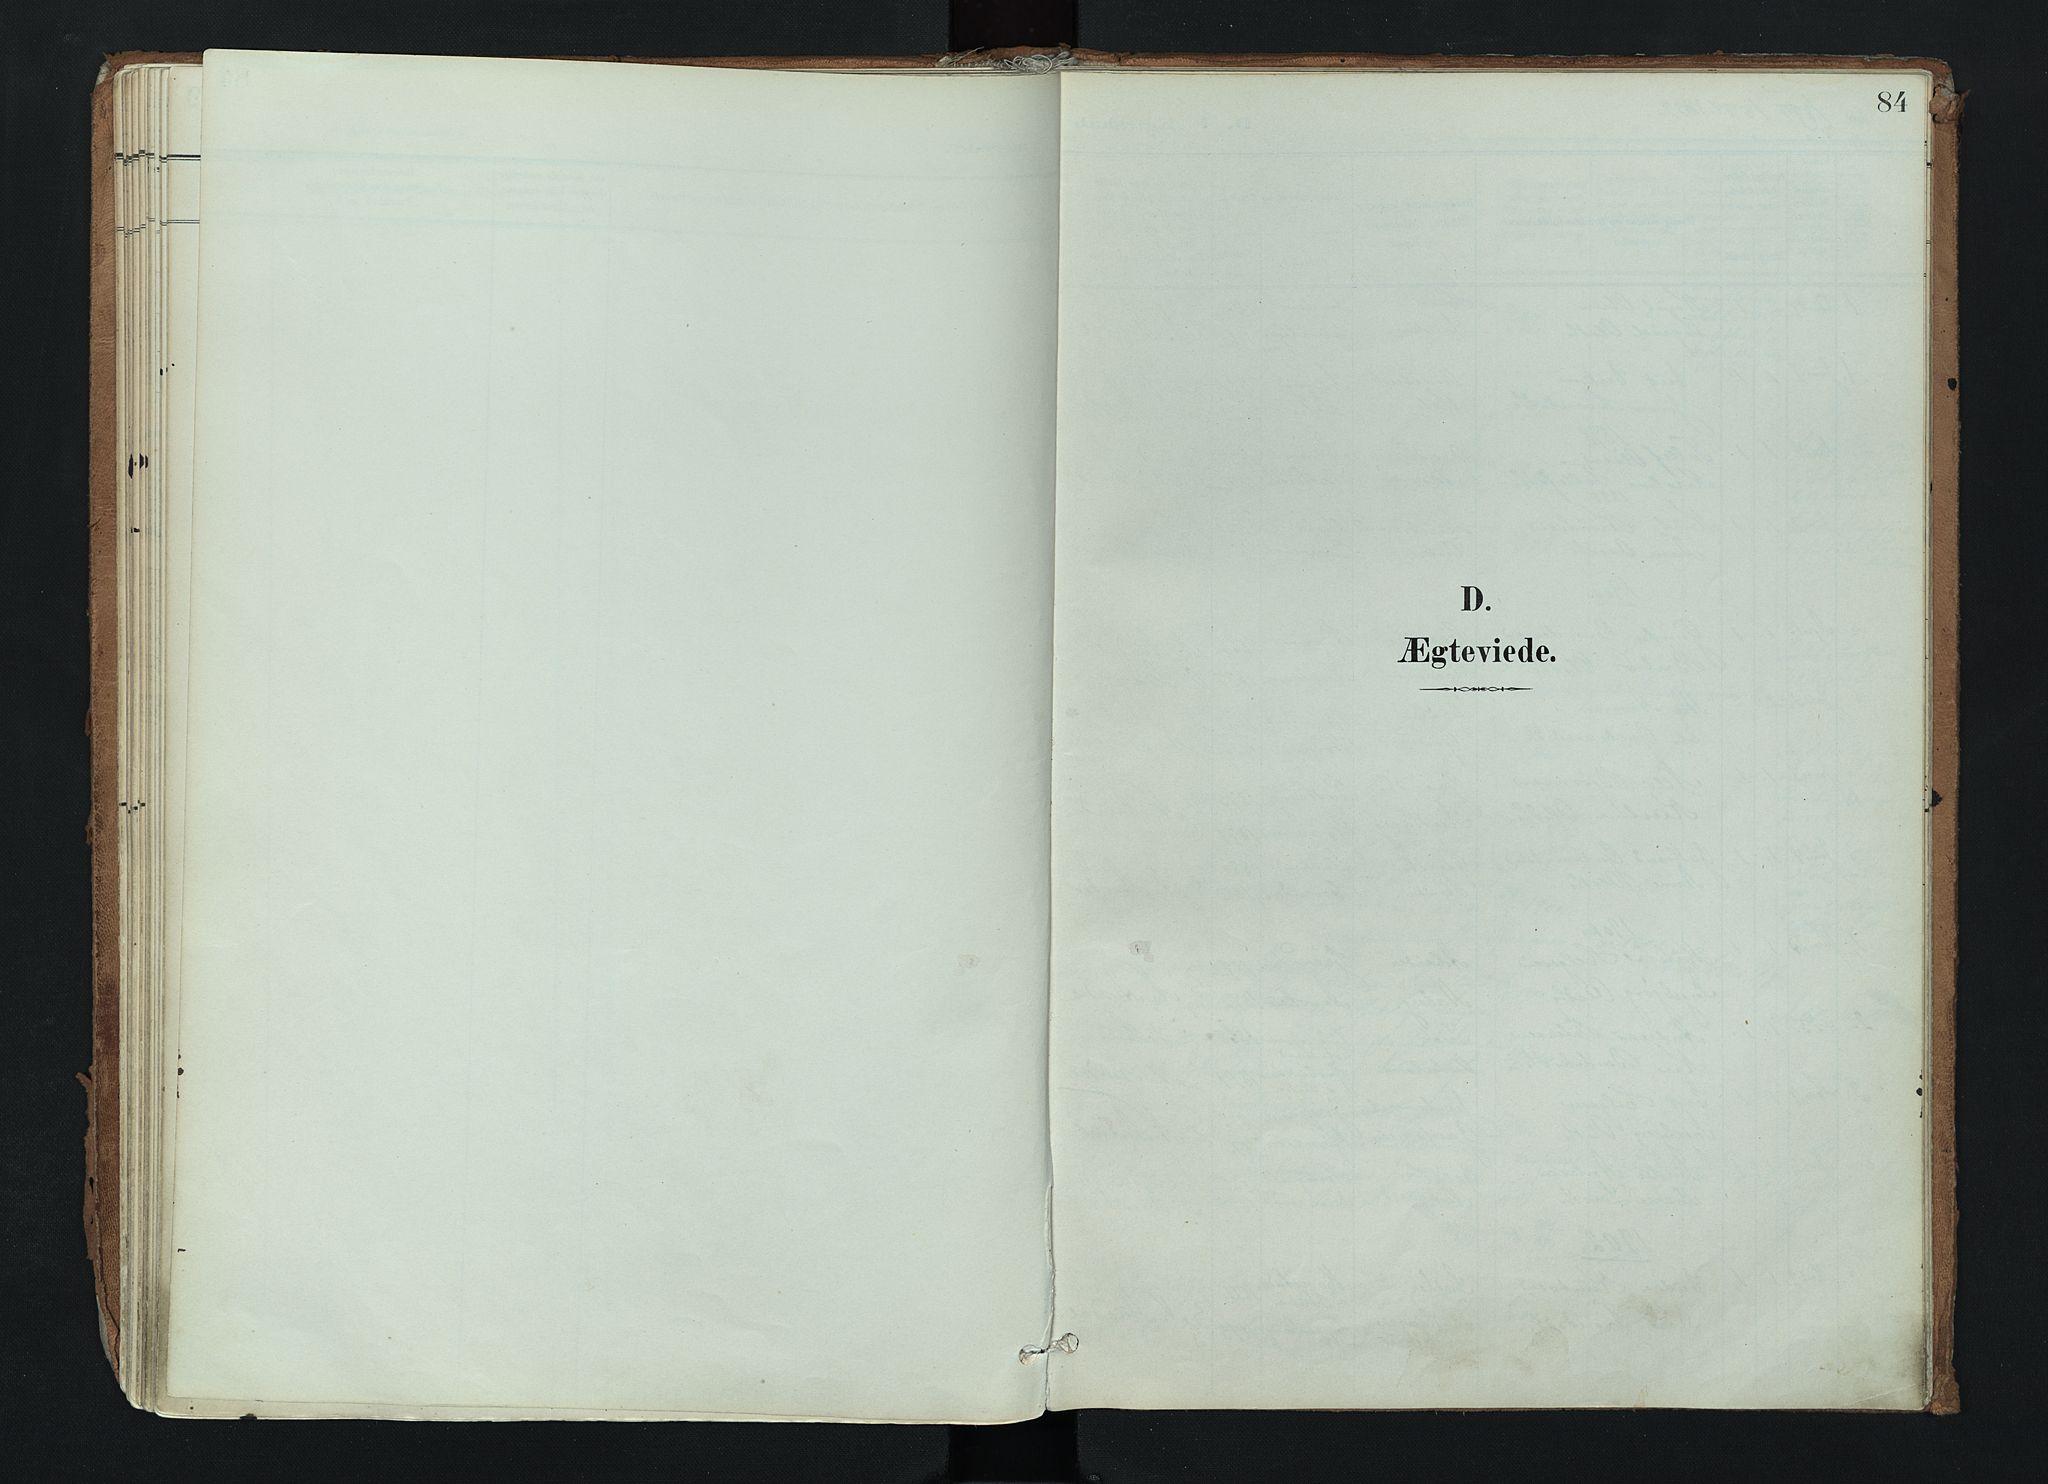 SAH, Nord-Aurdal prestekontor, Ministerialbok nr. 17, 1897-1926, s. 84